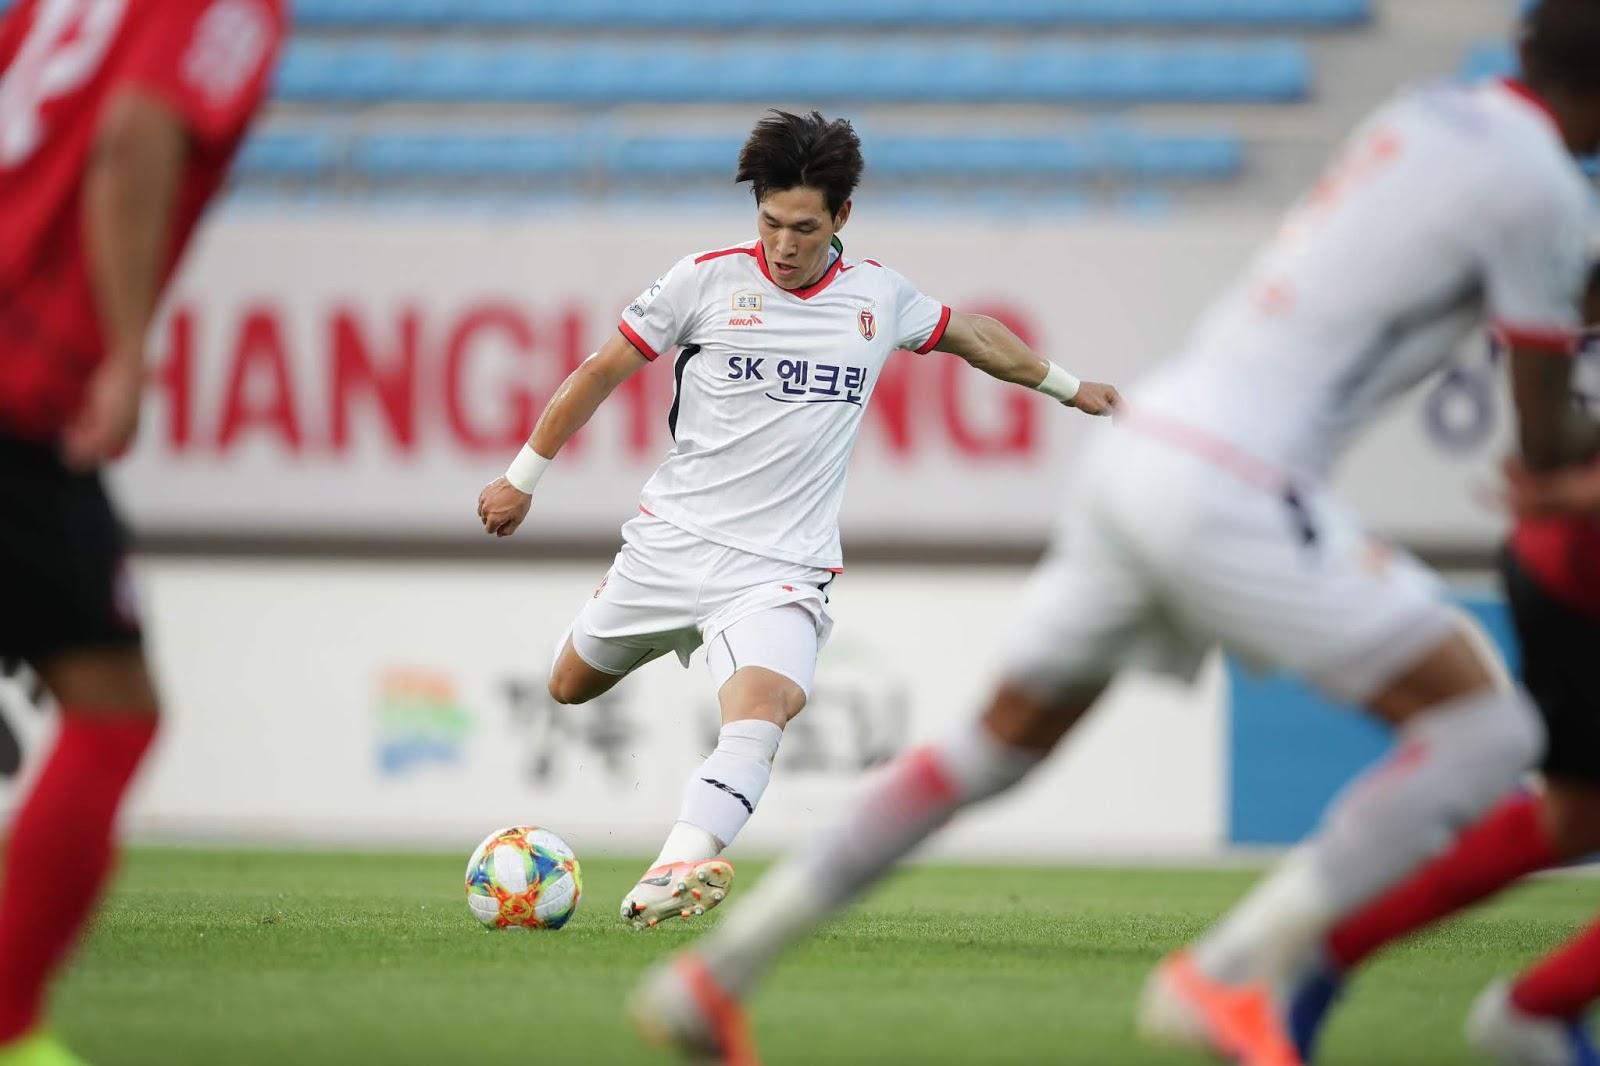 Preview: Jeju United vs Seongnam FC K League 1 Round 16